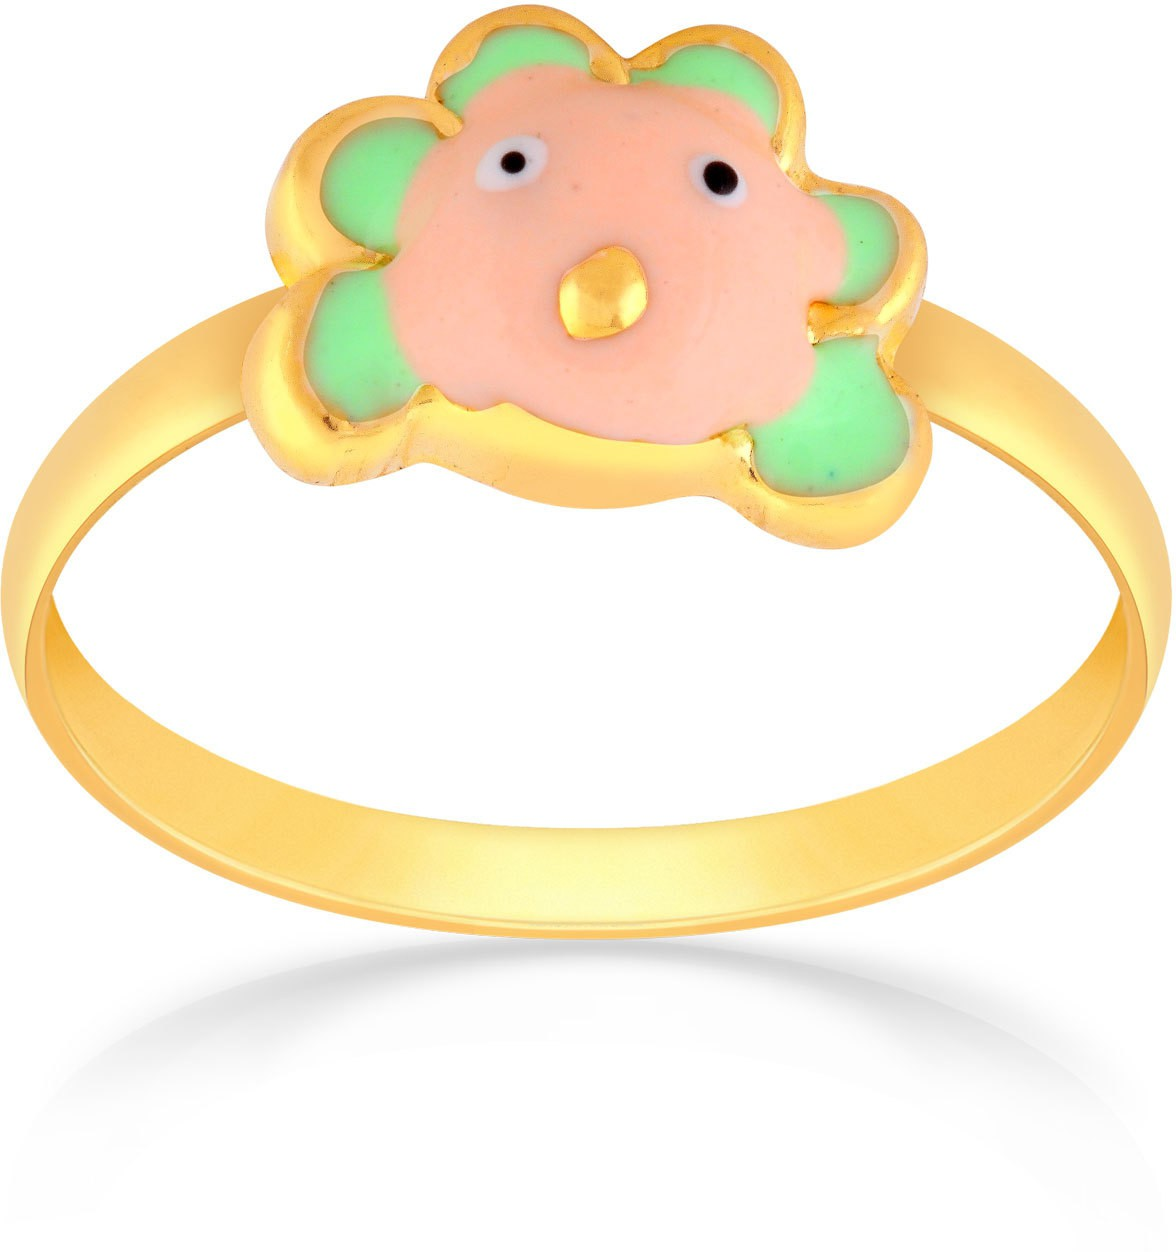 Deals - Delhi - Rings <br> Precious Jewellery<br> Category - jewellery<br> Business - Flipkart.com